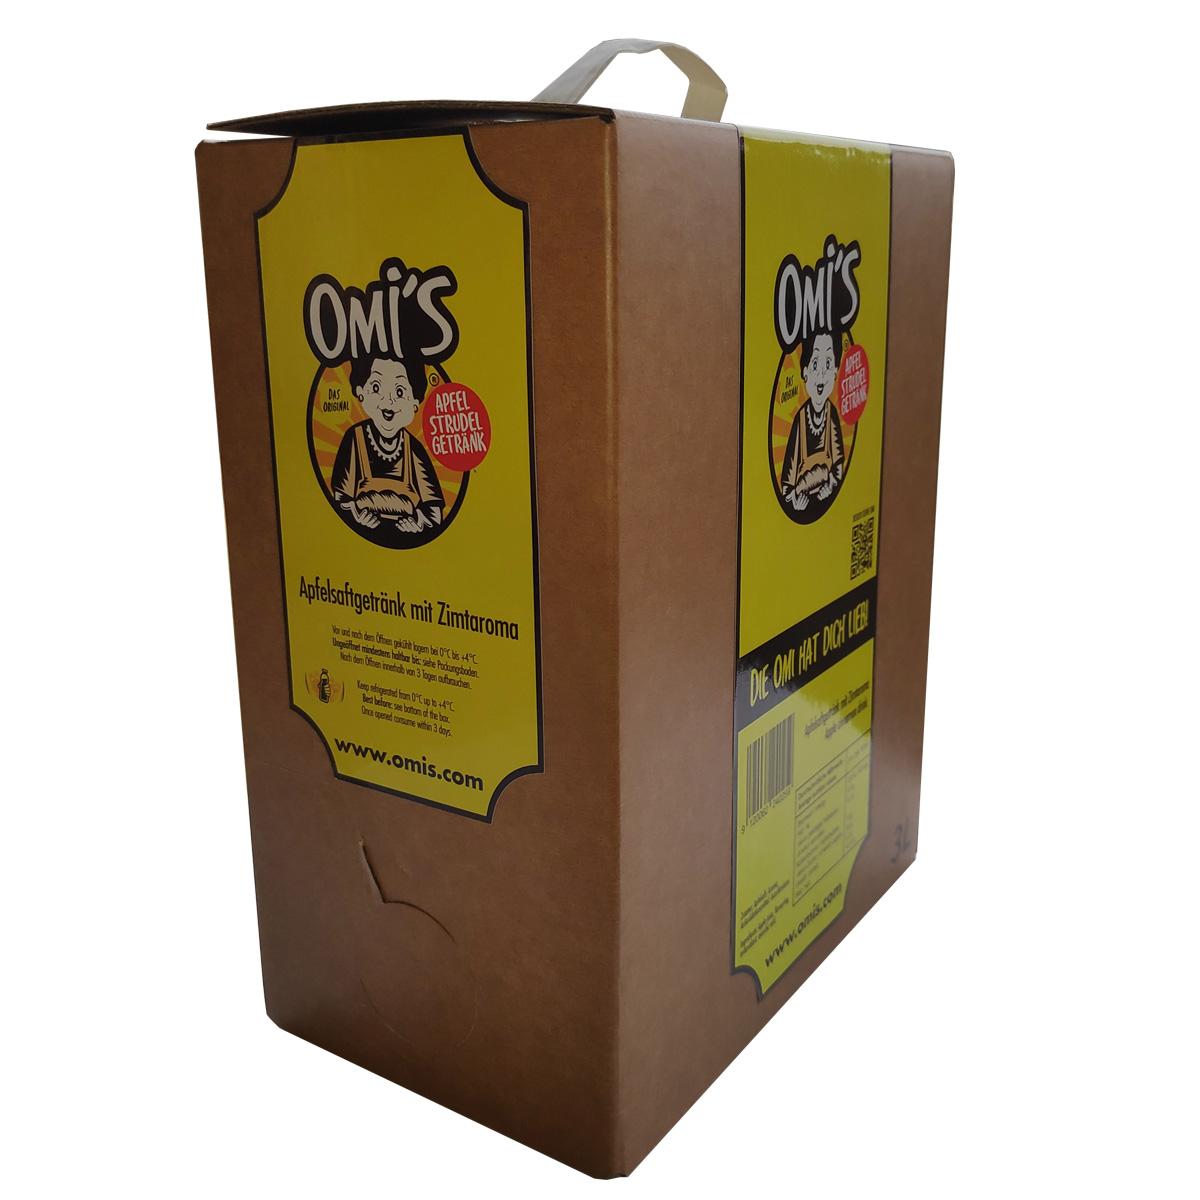 OMI´S APFELSTRUDEL 3L BAG IN BOX